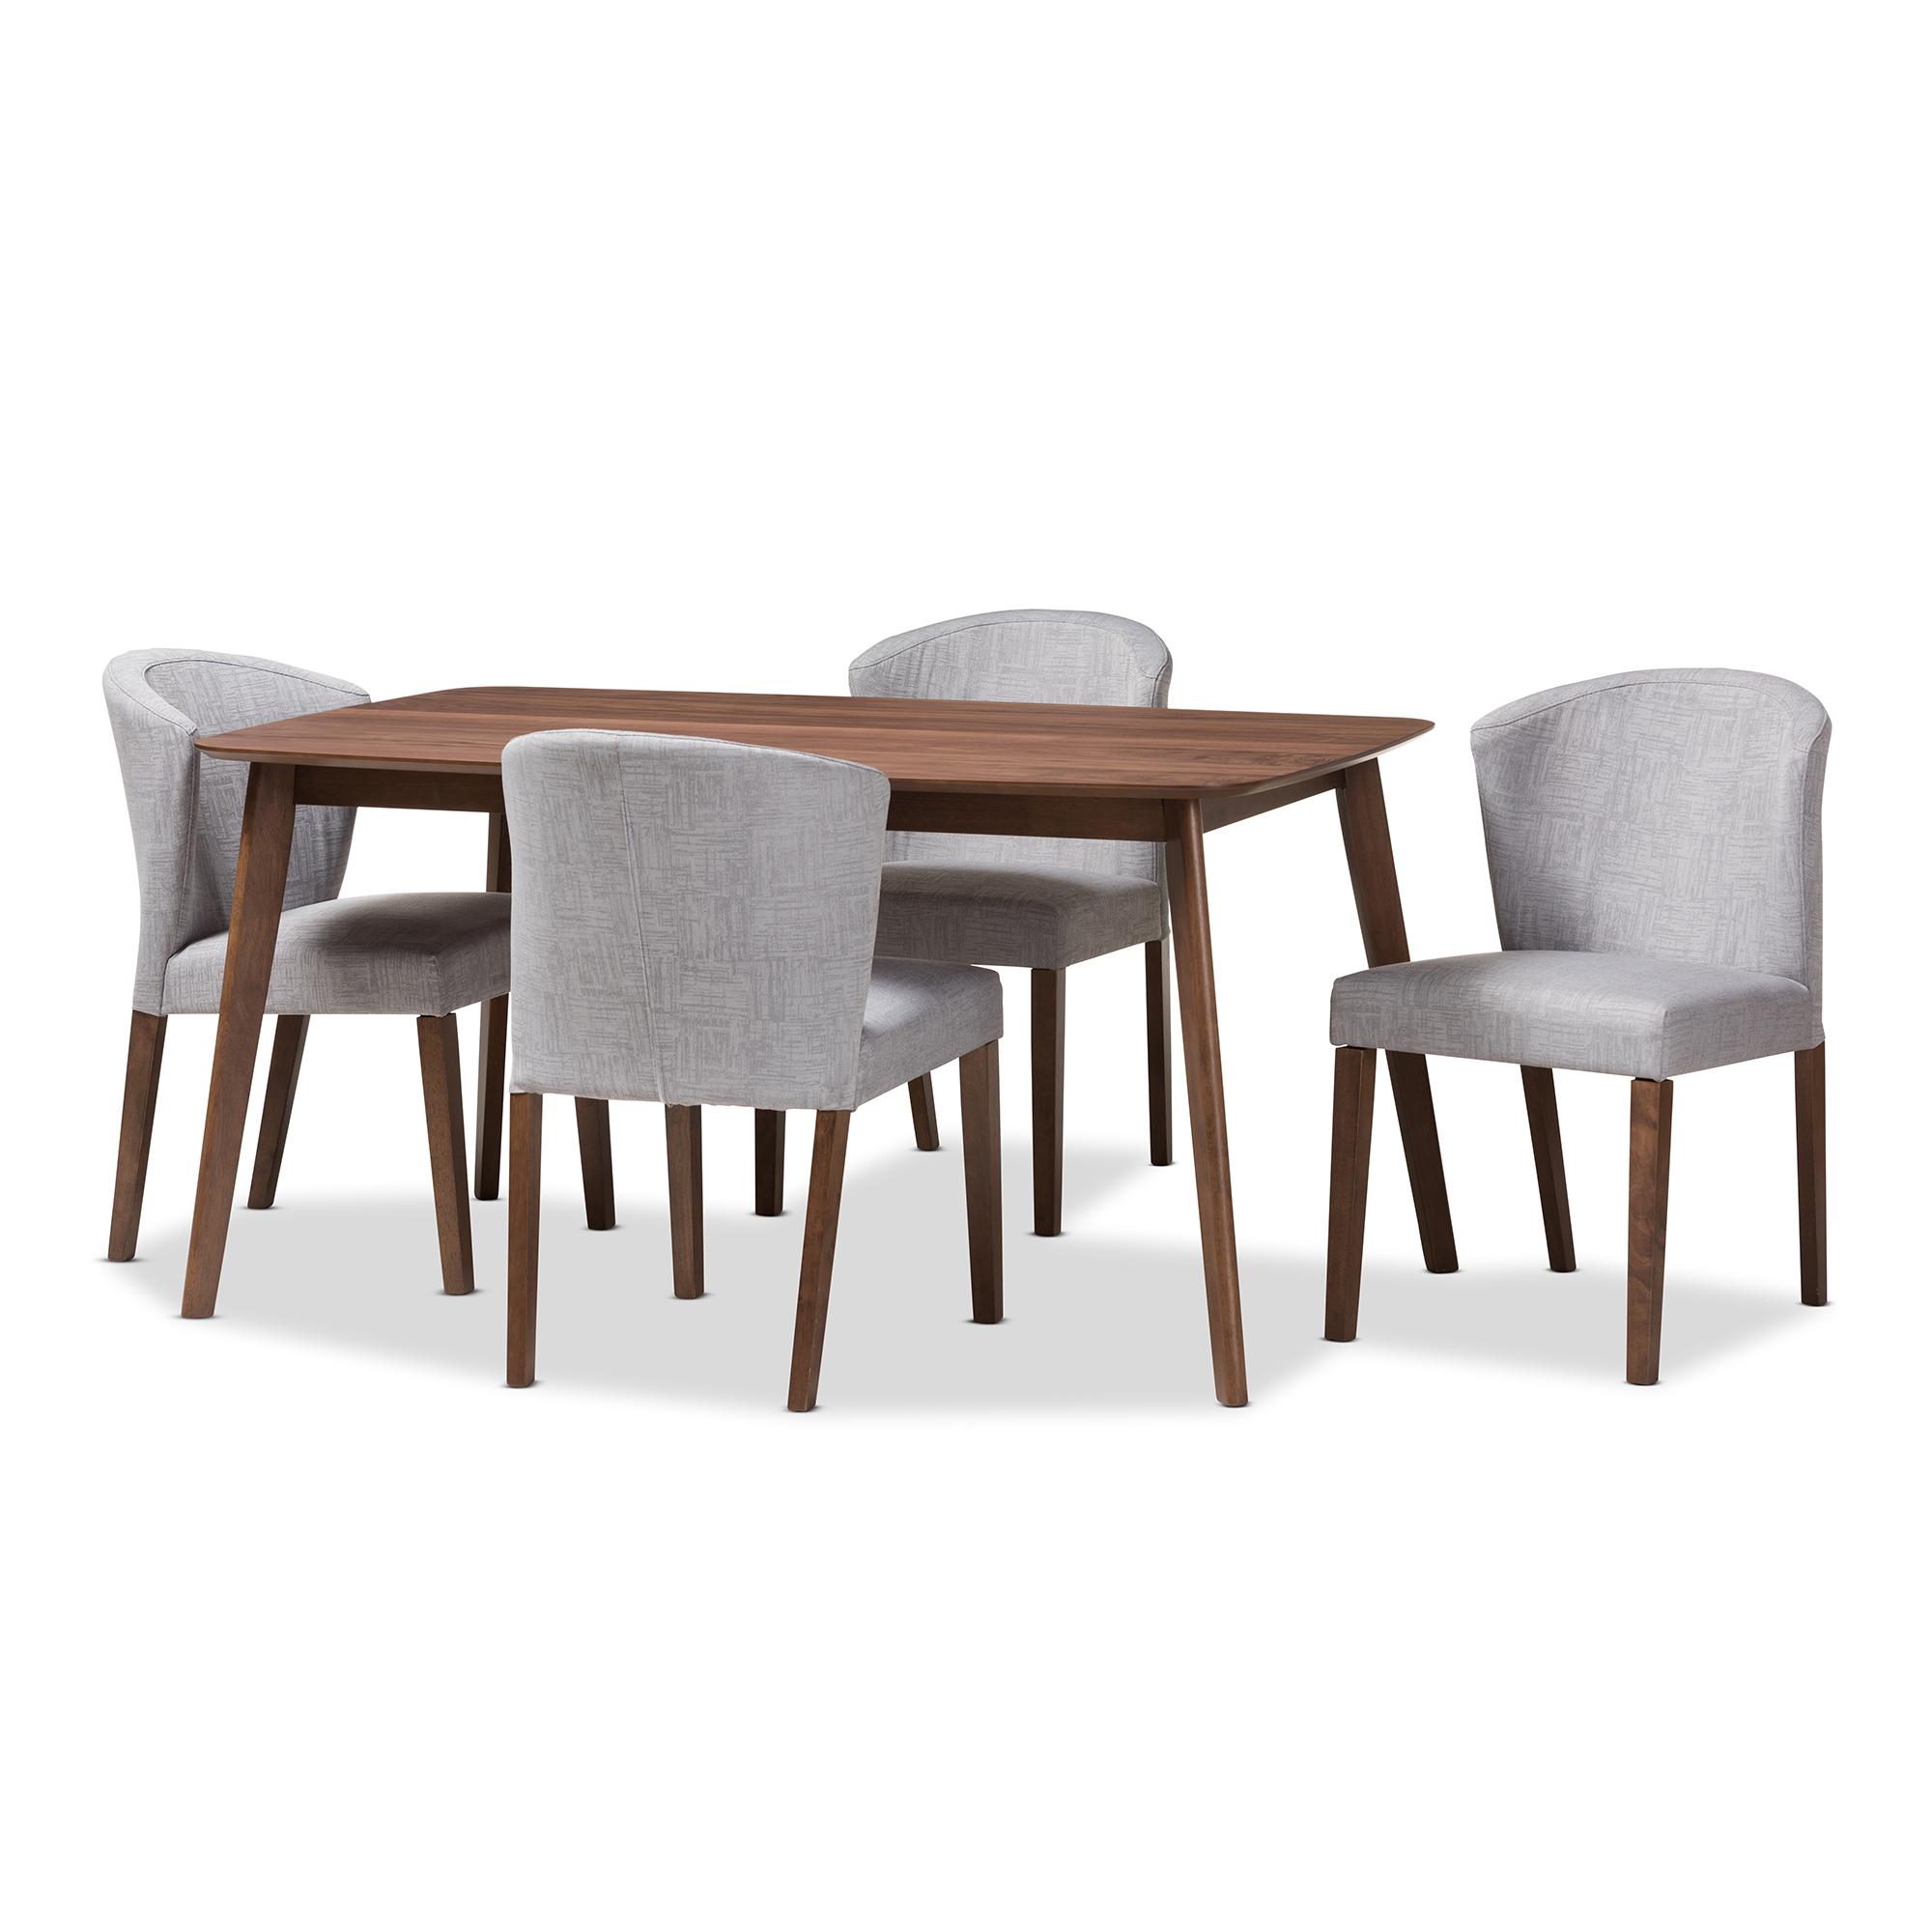 Baxton Studio Cassie Mid-Century Modern Walnut Wood Fabric 5-Piece Dining Set, Multiple Colors